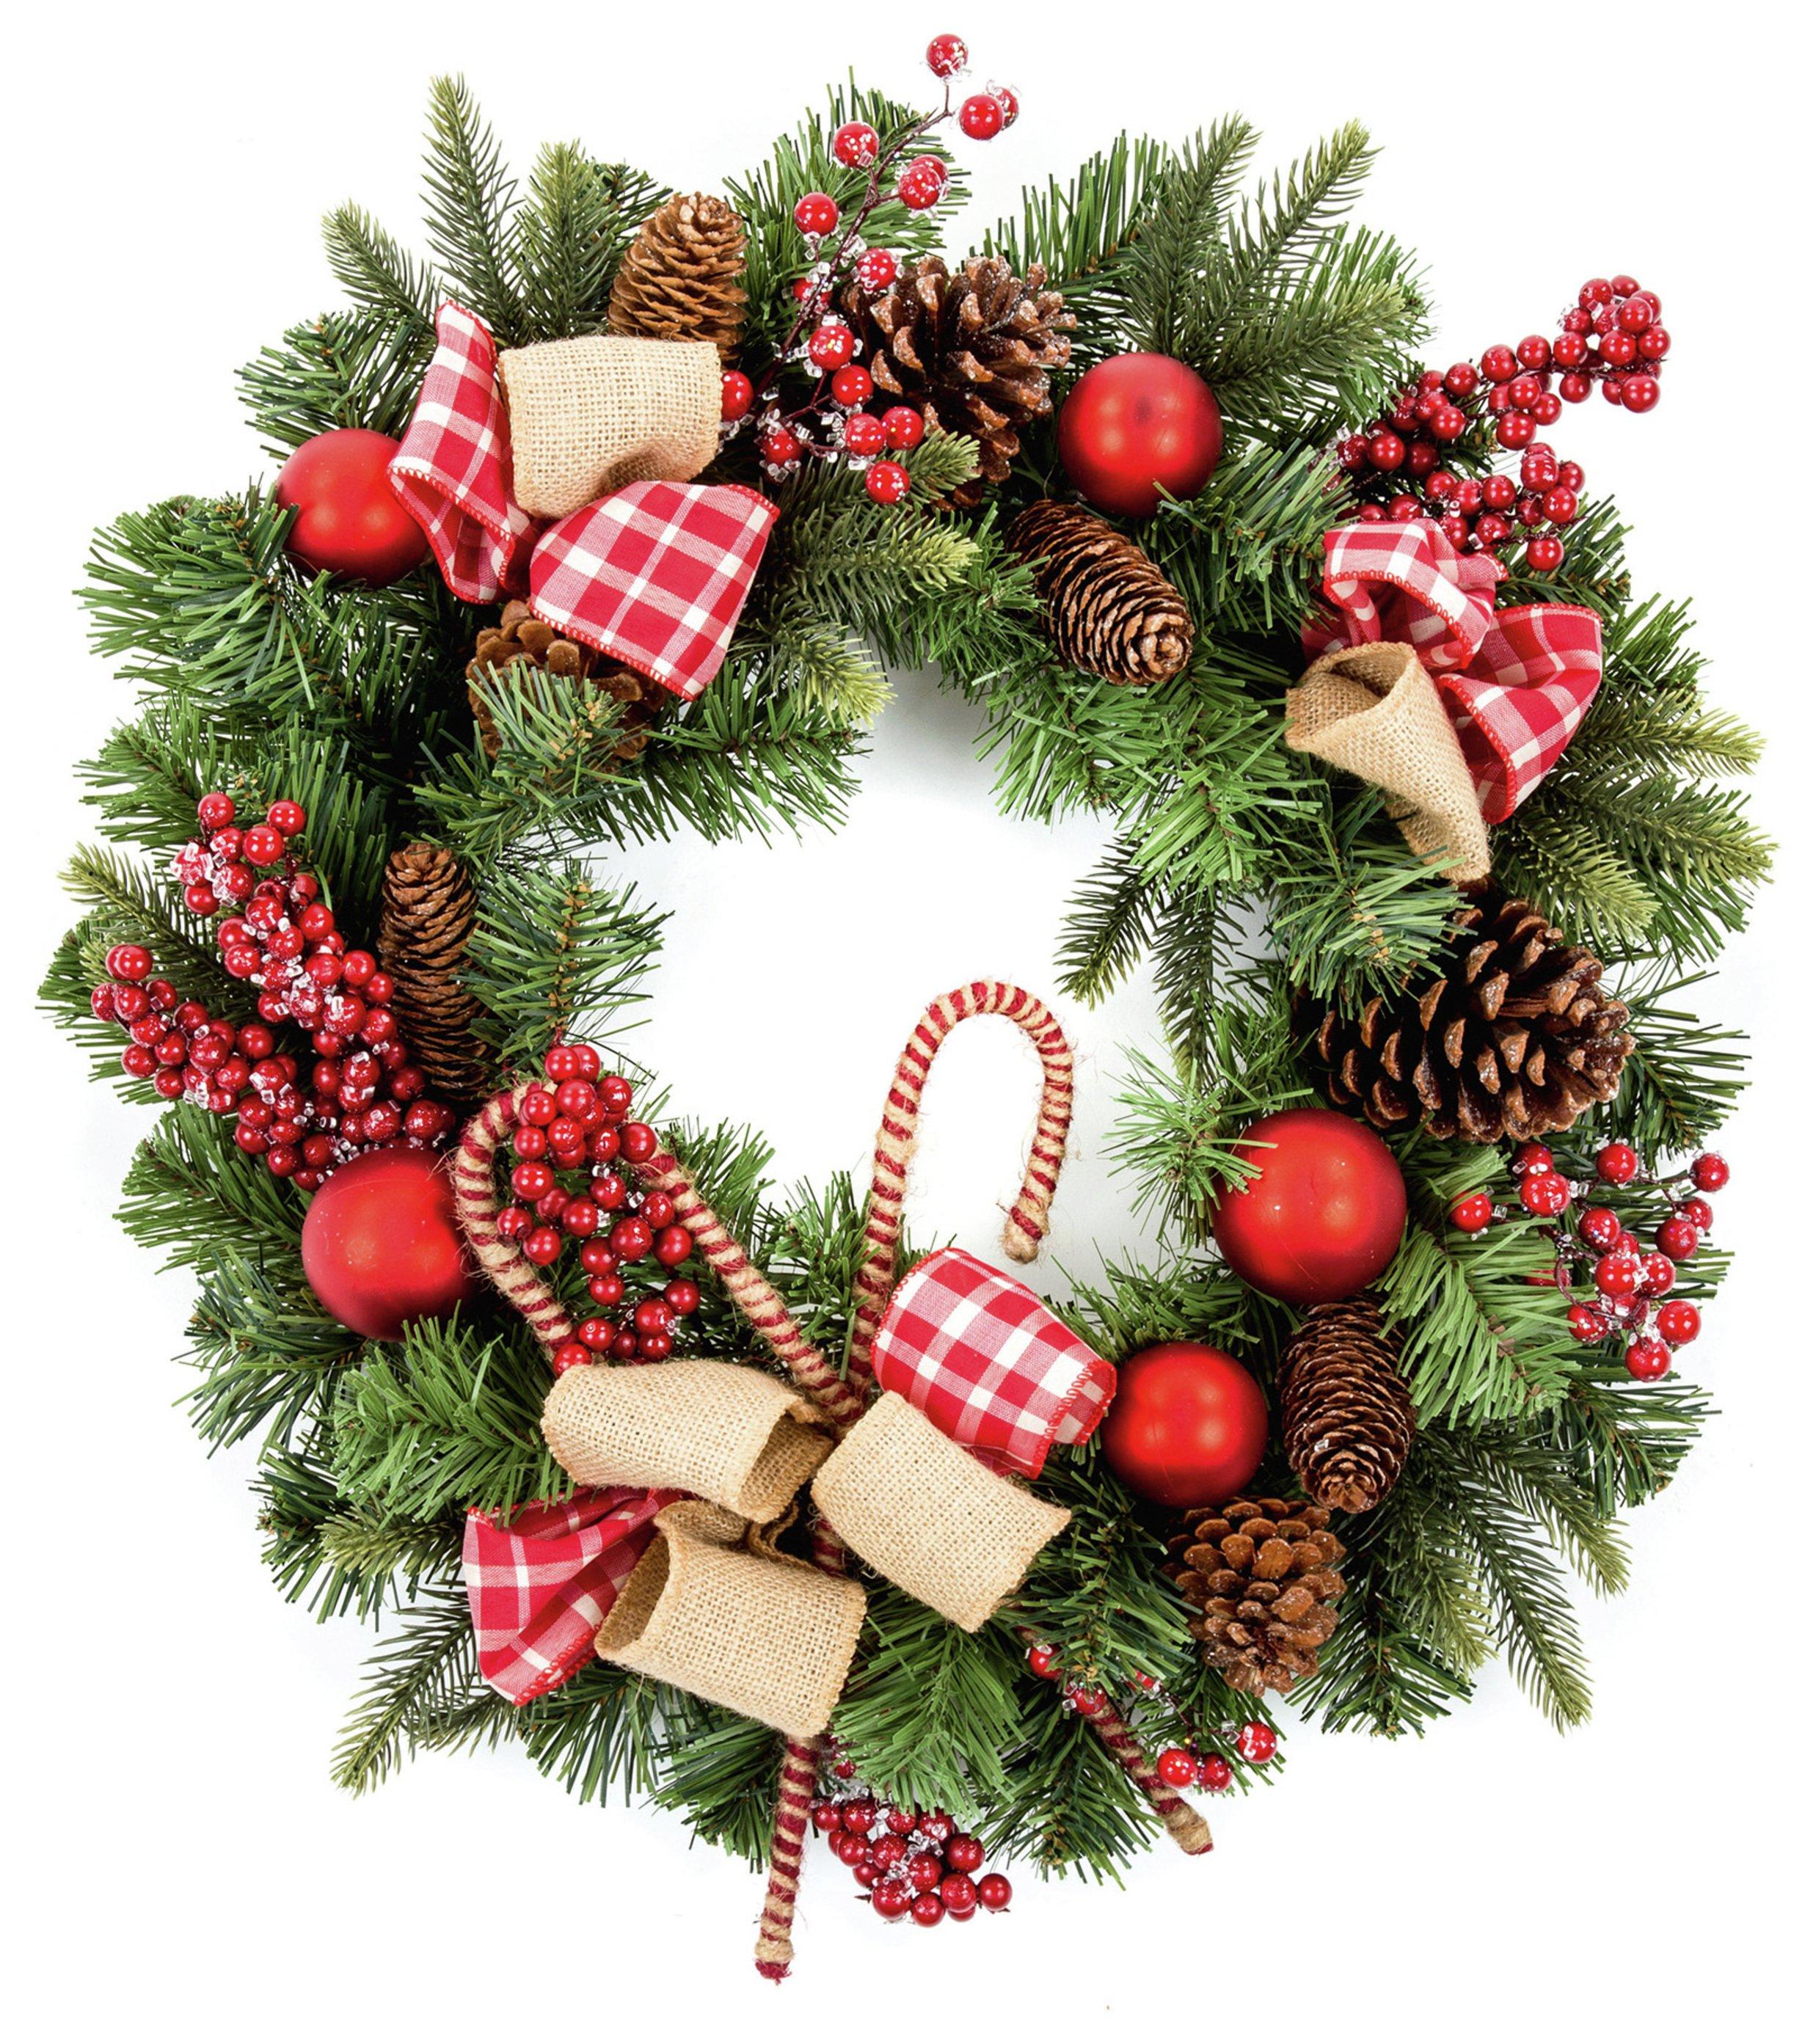 premier-decorations-55cm-candy-cane-stick-wreath-green